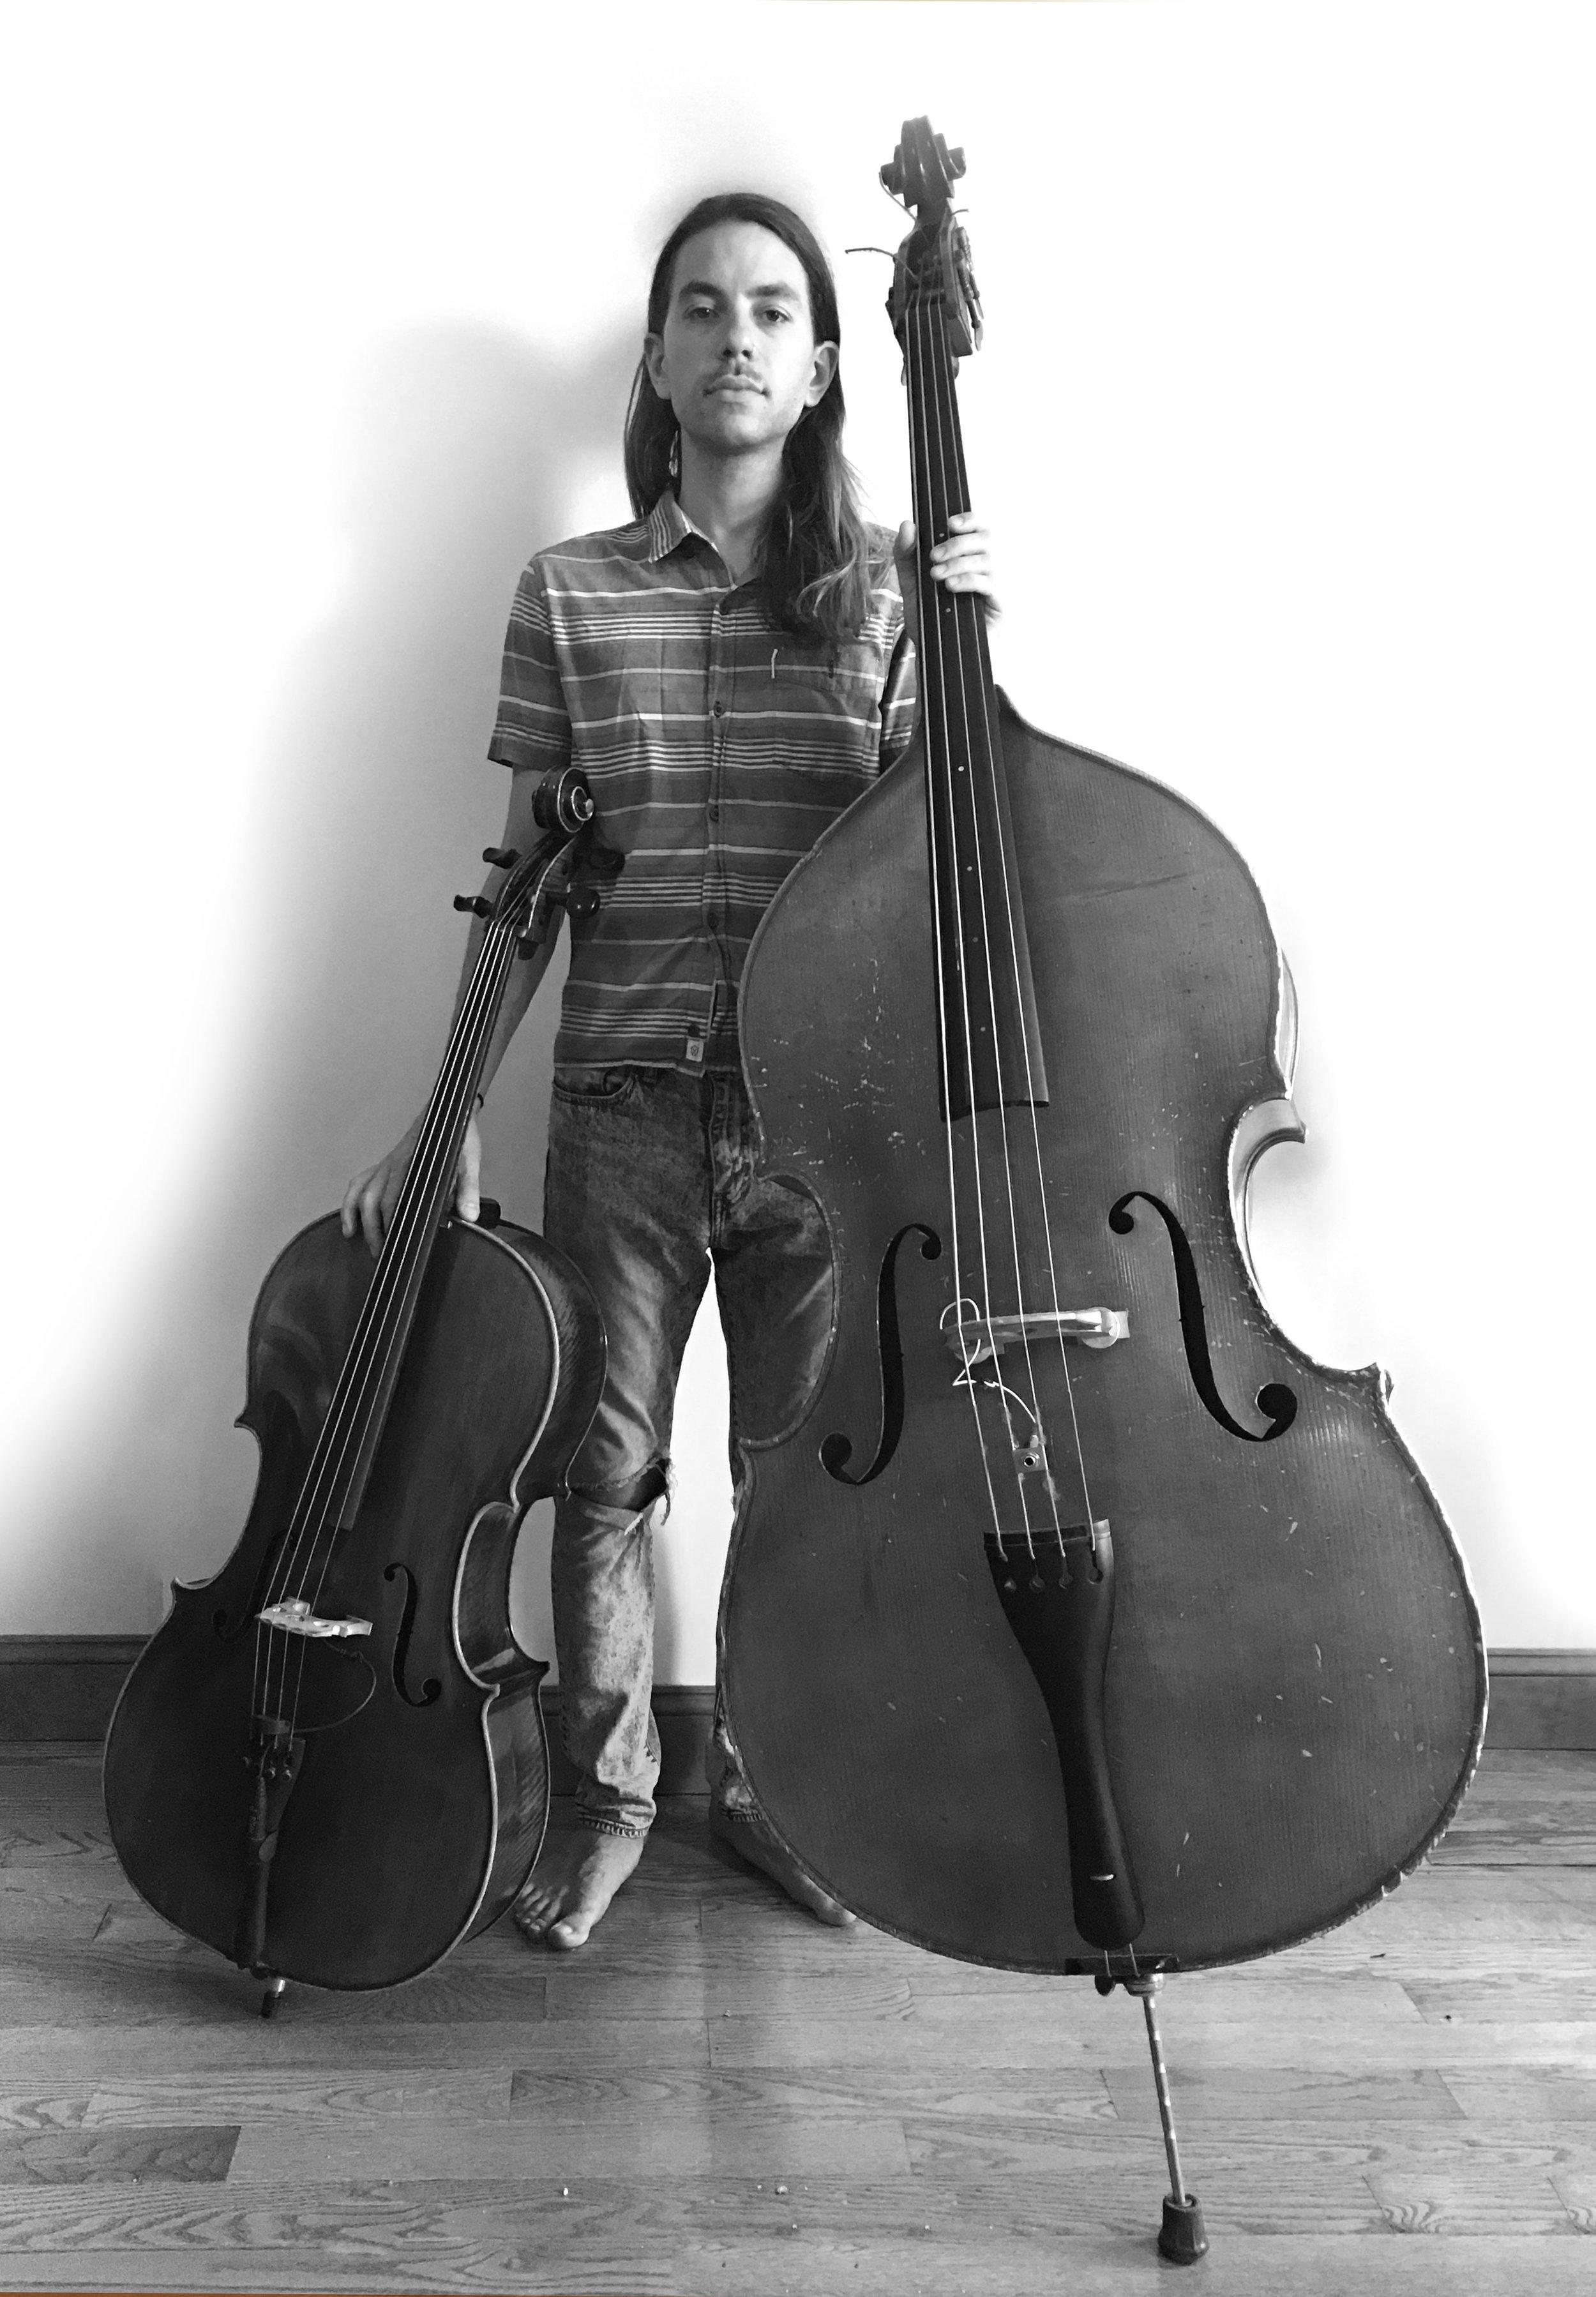 Nicholas-Jozwiak-New-York-City-NYC-cello-cellist-bass-bassist-jazz.jpg